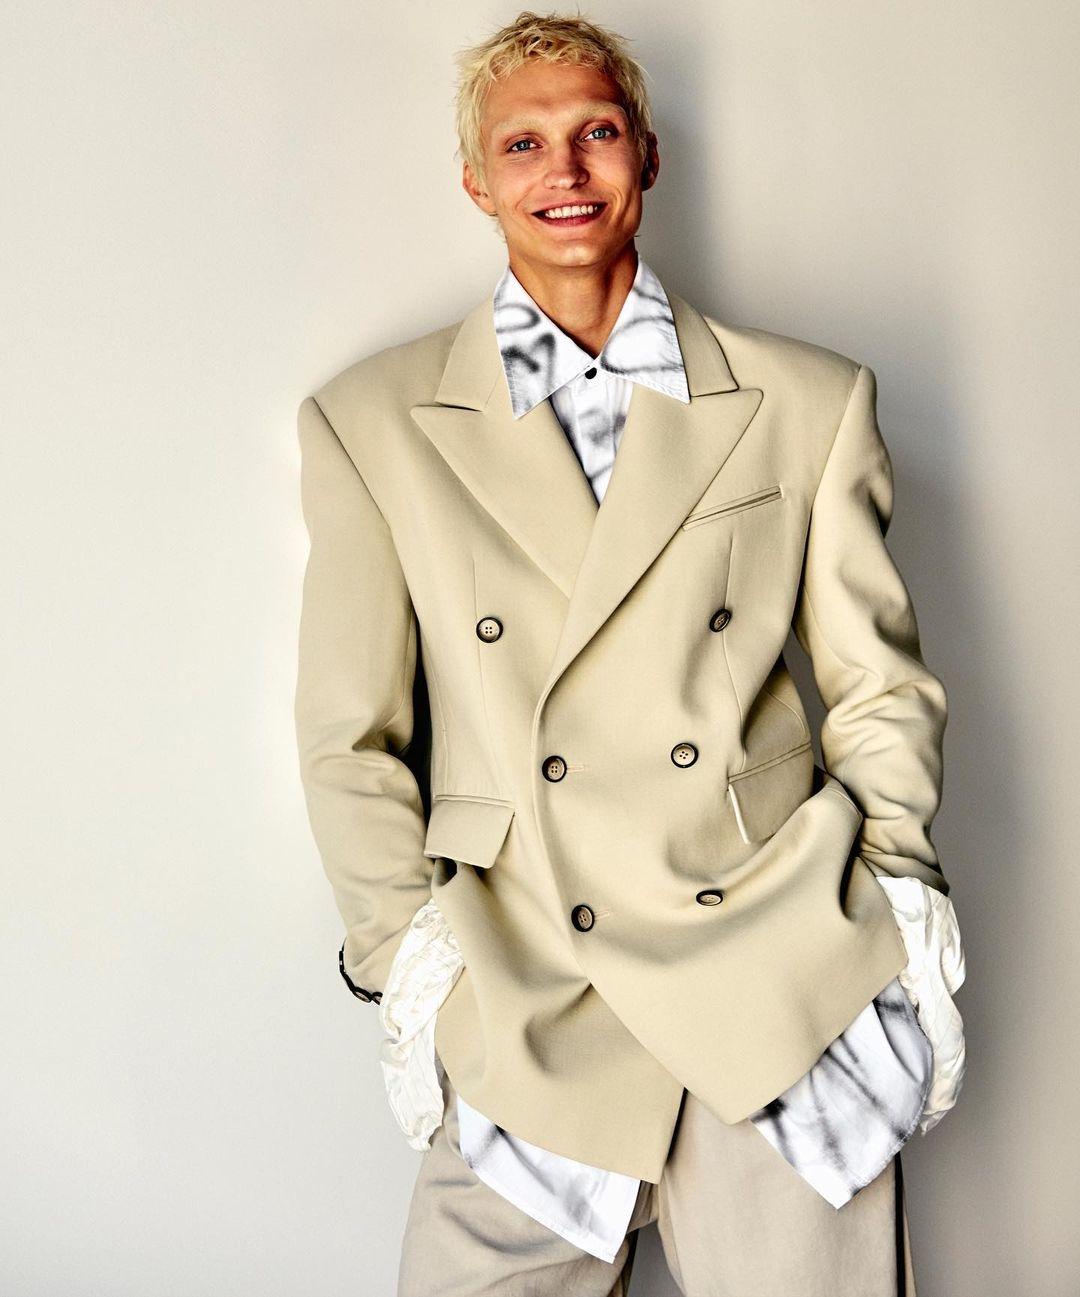 Made in Ukraine: австрийский инфлюэнсер Мартин Емеле в пиджаке украинского бренда Elena Burenina (ФОТО) - фото №3